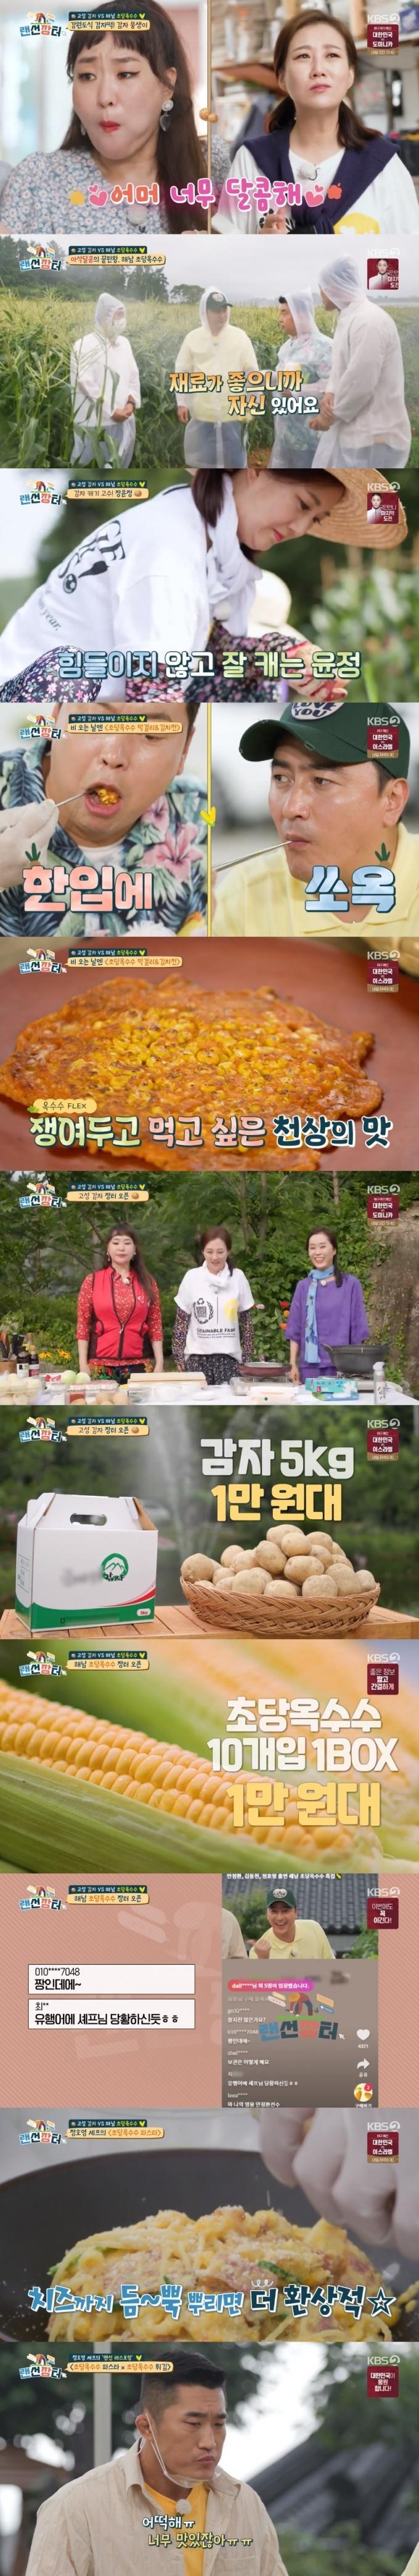 KBS 2TV '랜선장터' 캡처 © 뉴스1